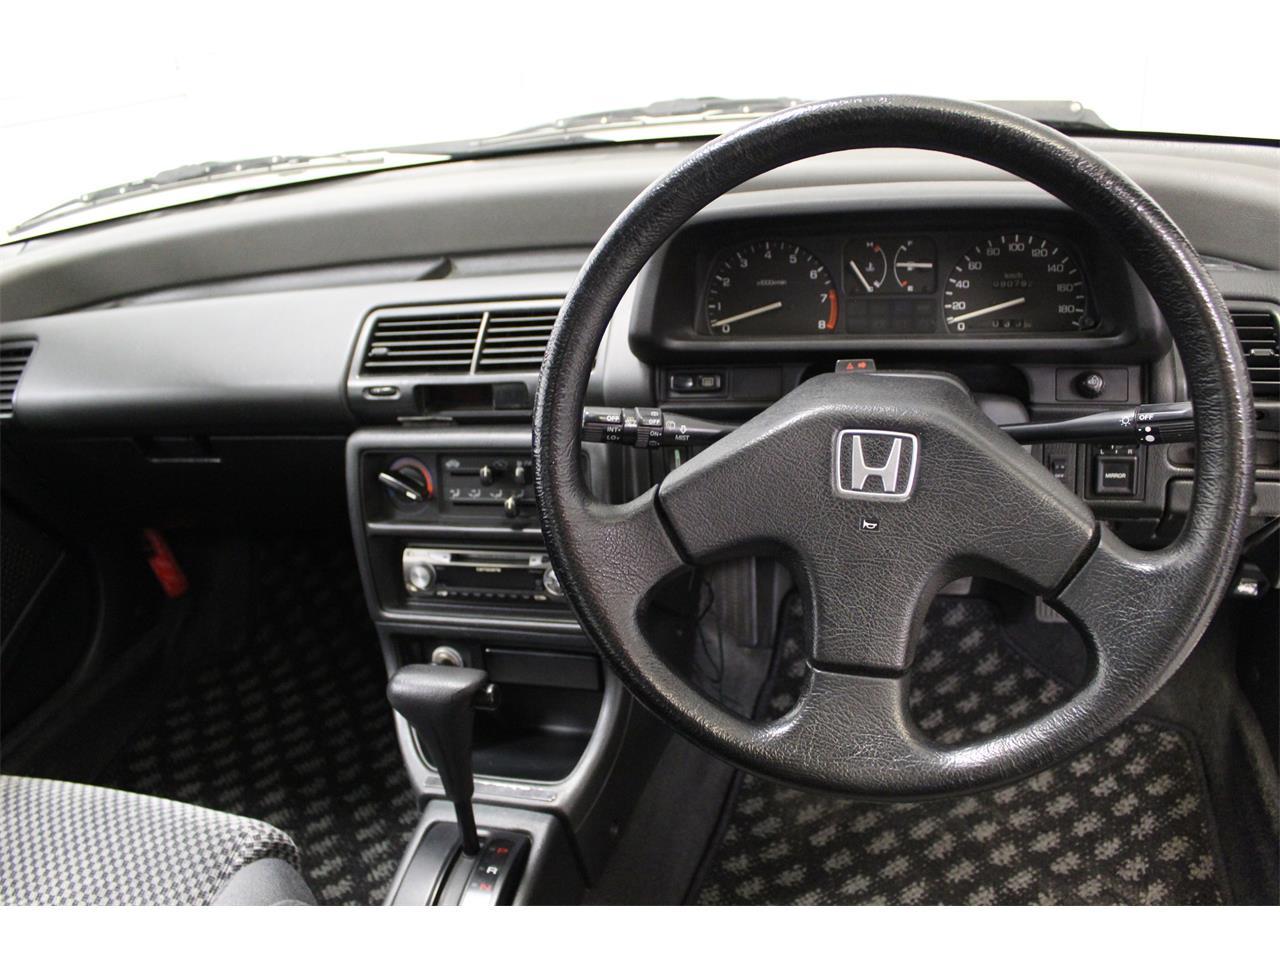 1989 Honda Civic (CC-1178947) for sale in Christiansburg, Virginia